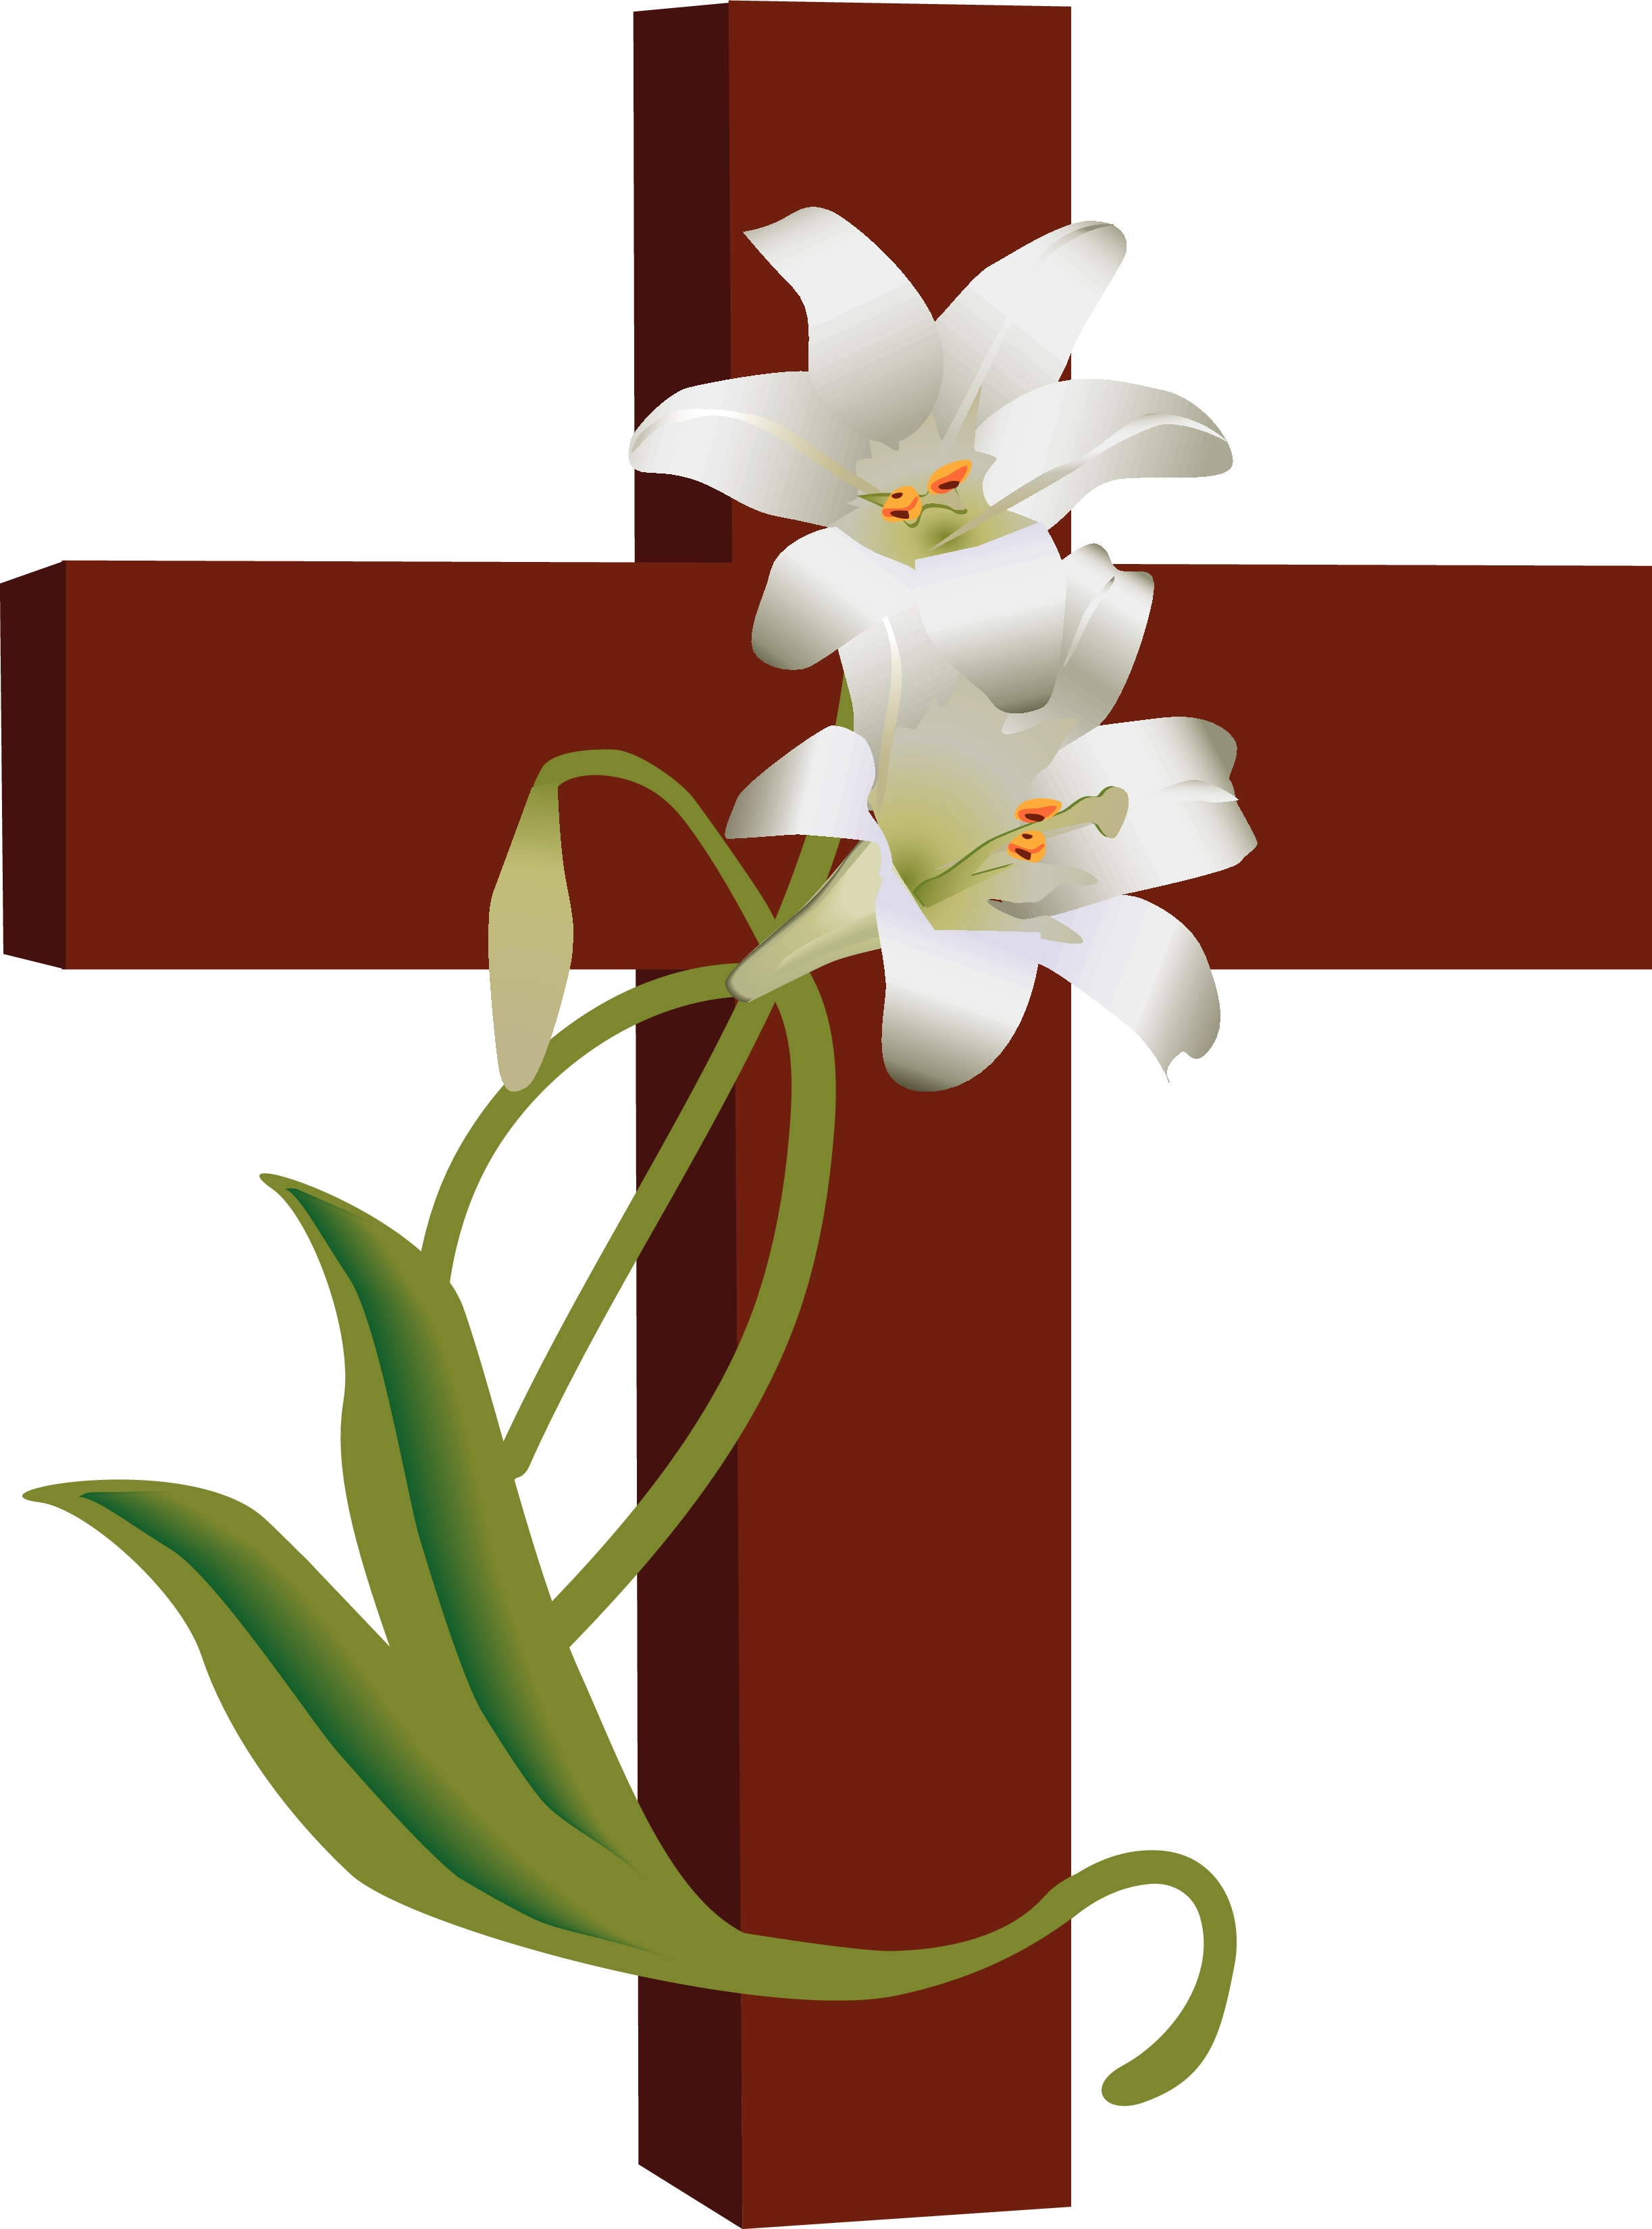 Jesus Cross Clip Art | Clipart Panda - Free Clipart Images